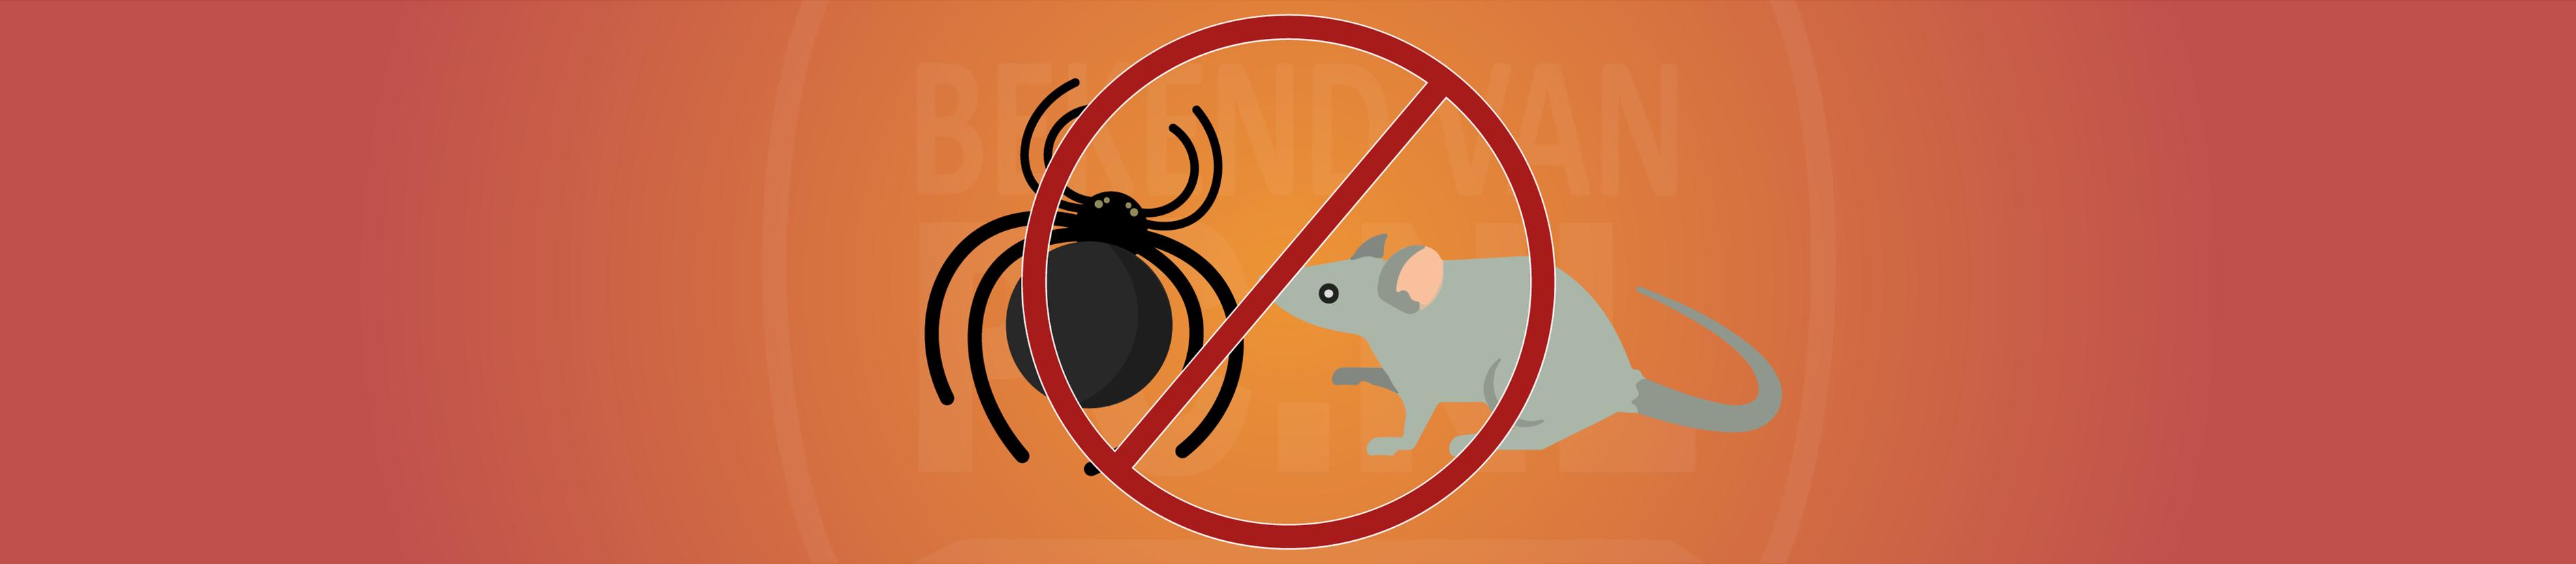 Insecten & Ongedierte